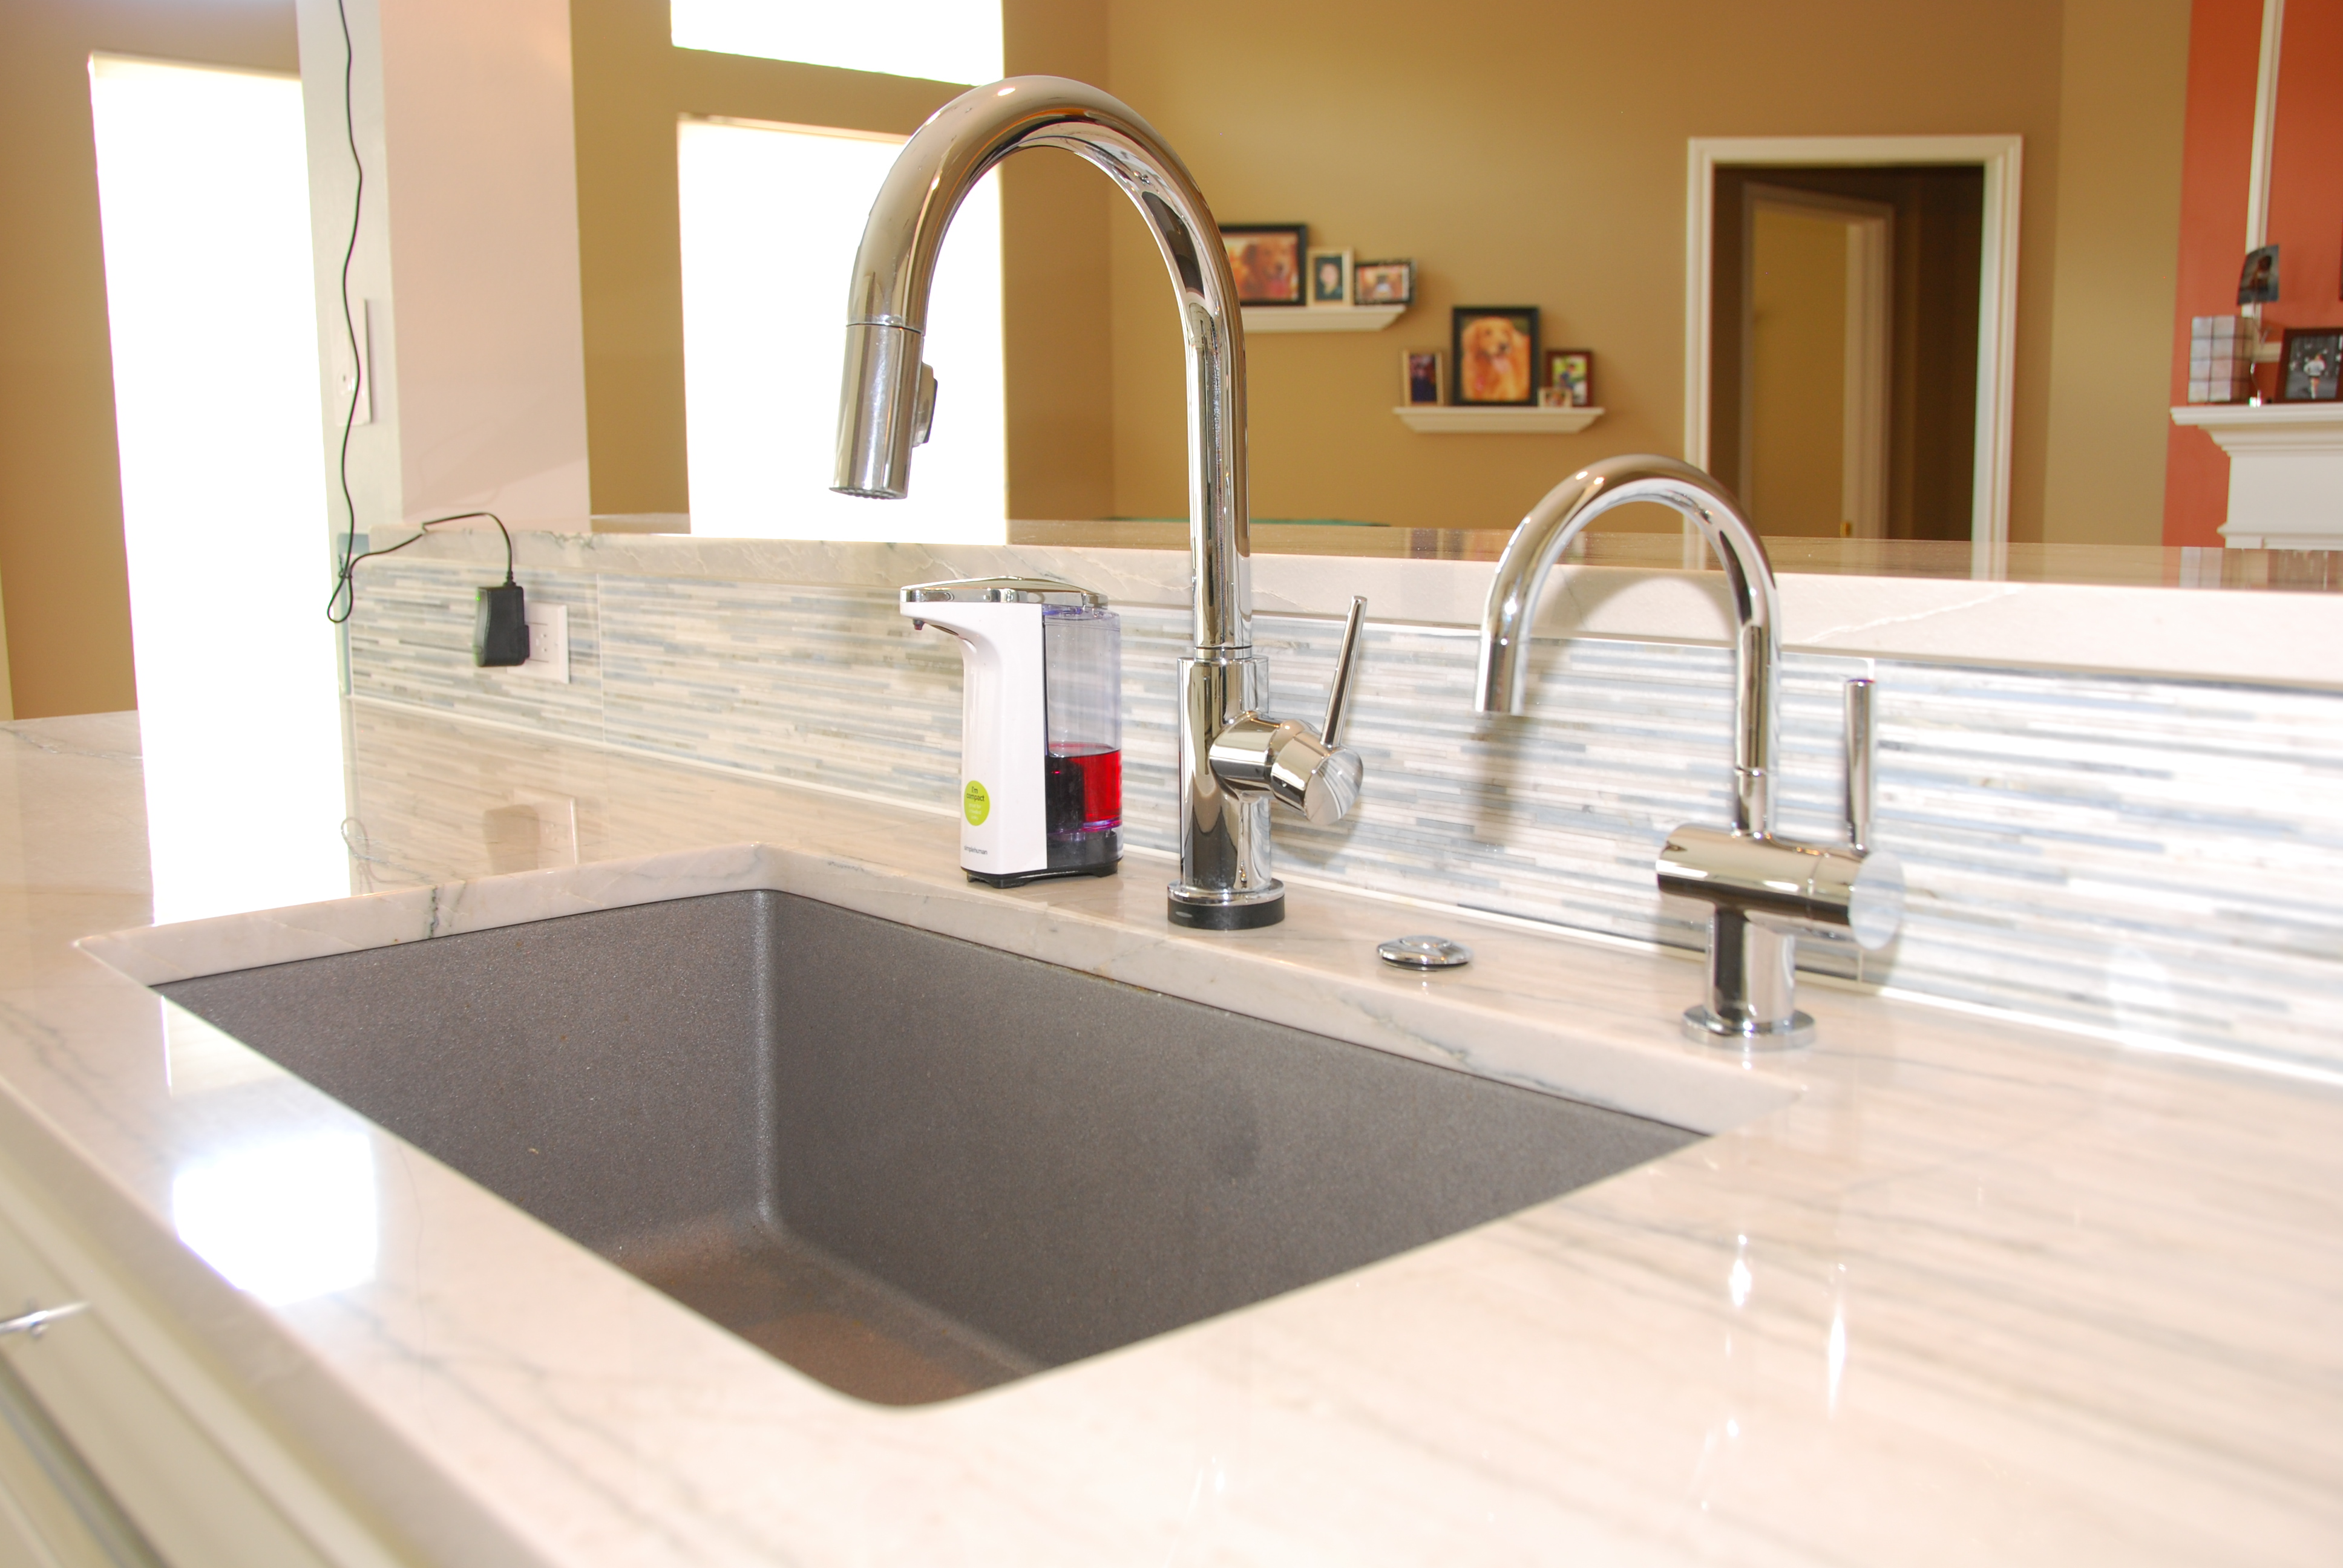 delta trinsic kitchen faucet amazing design delta trinsic kitchen faucet delta trinsic kitchen faucet idea kristybaby